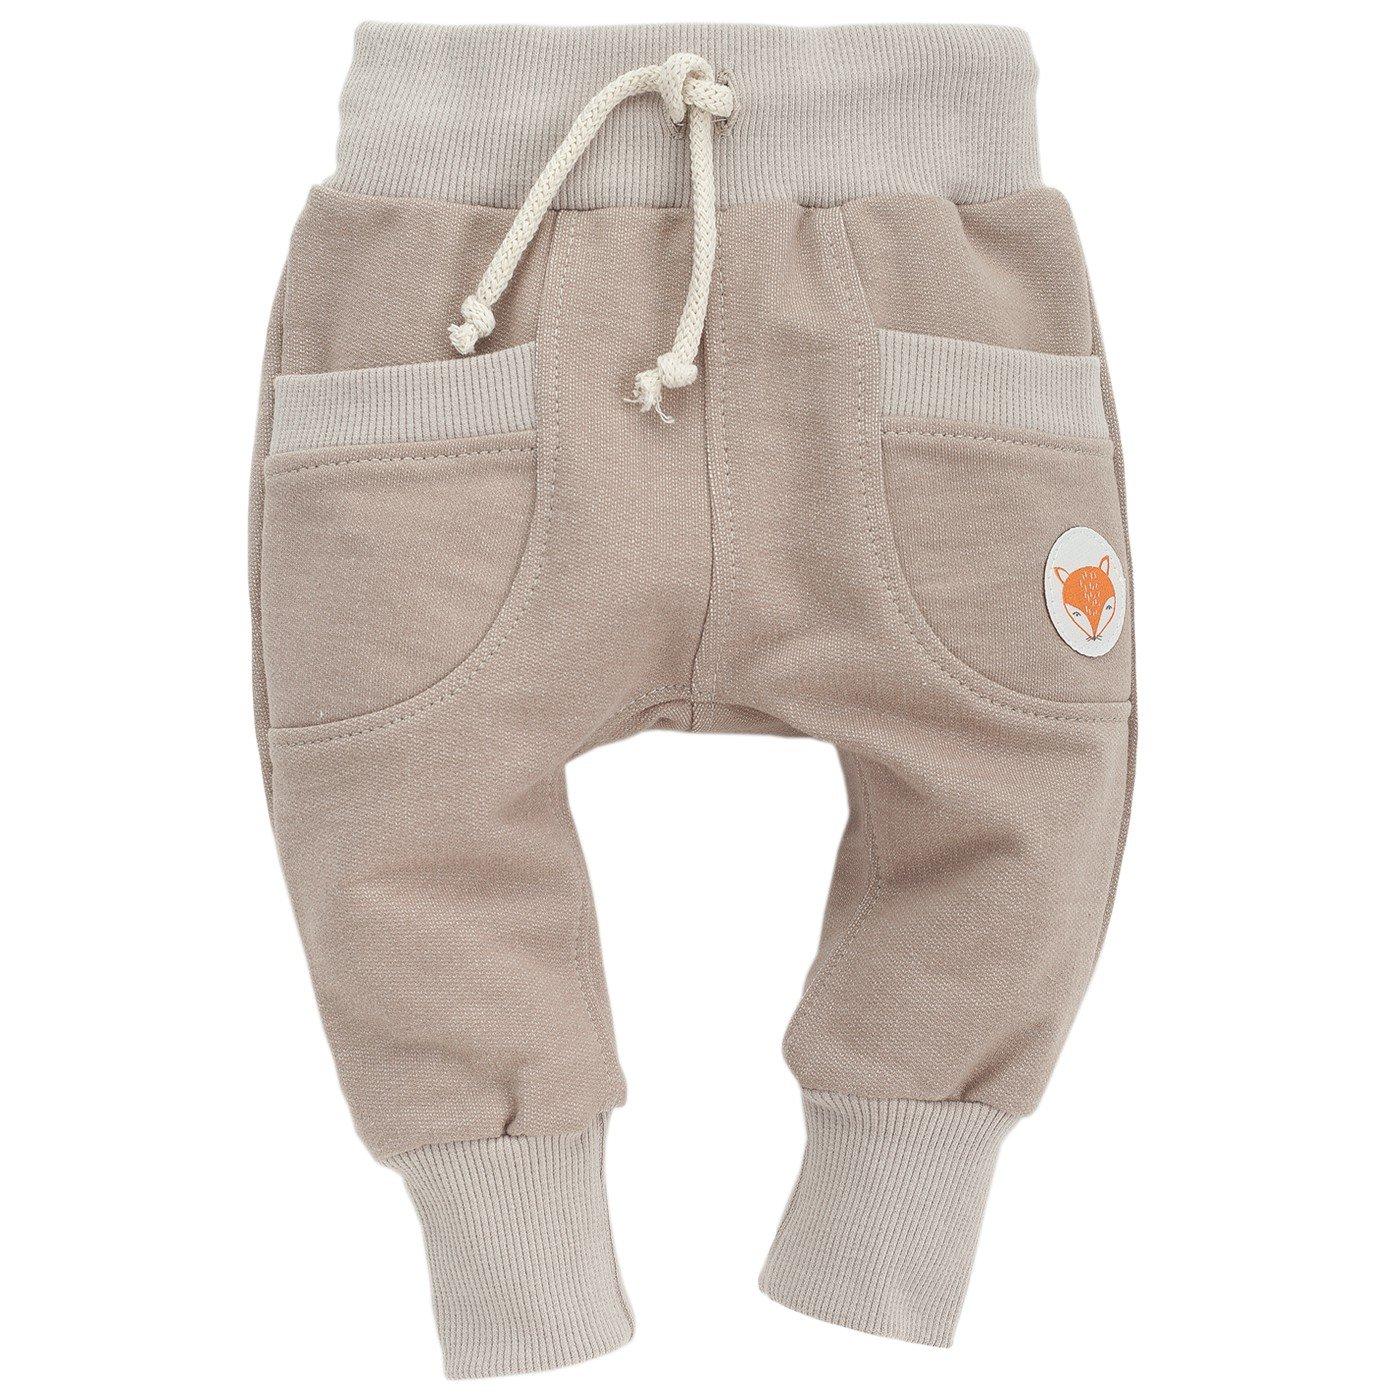 Pinokio–Smart Fox–Baby pantaloni 100% cotone, beige con volpe–Pantaloni da jogging, sonno Hose, Pantaloni harem–Elastico in vita